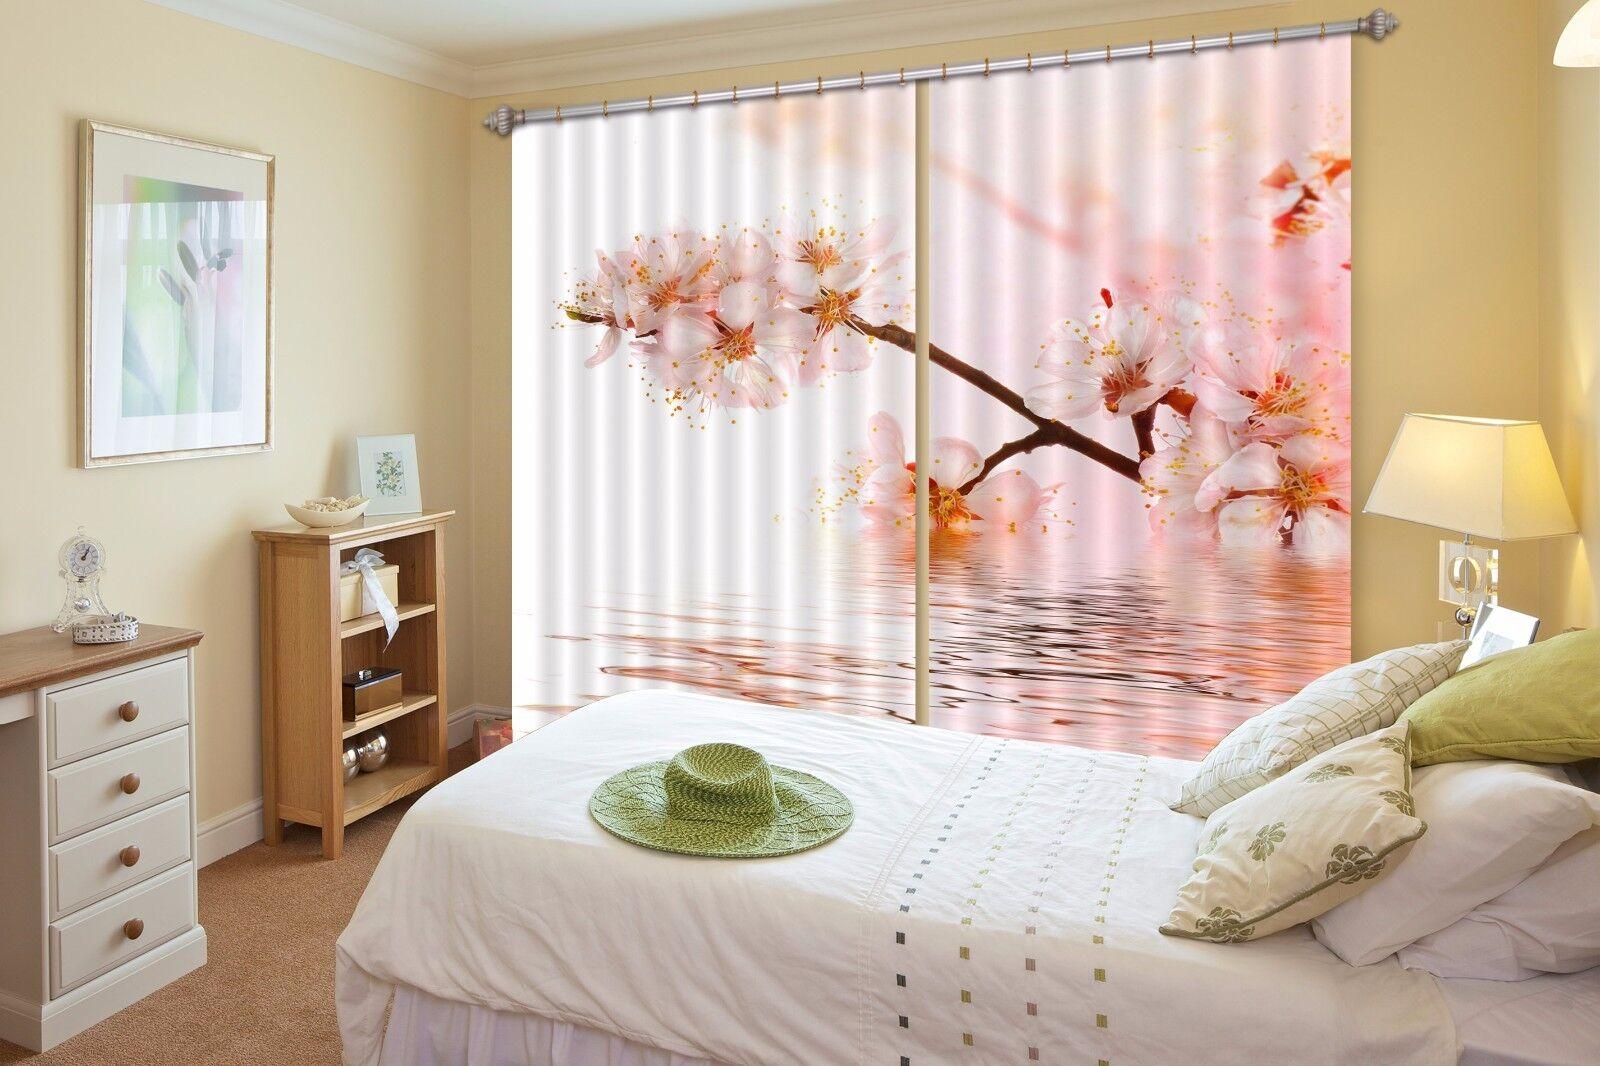 3D Melocotón Bloom Cortinas de impresión de cortina de foto 0 Blockout Tela Cortinas Ventana Reino Unido